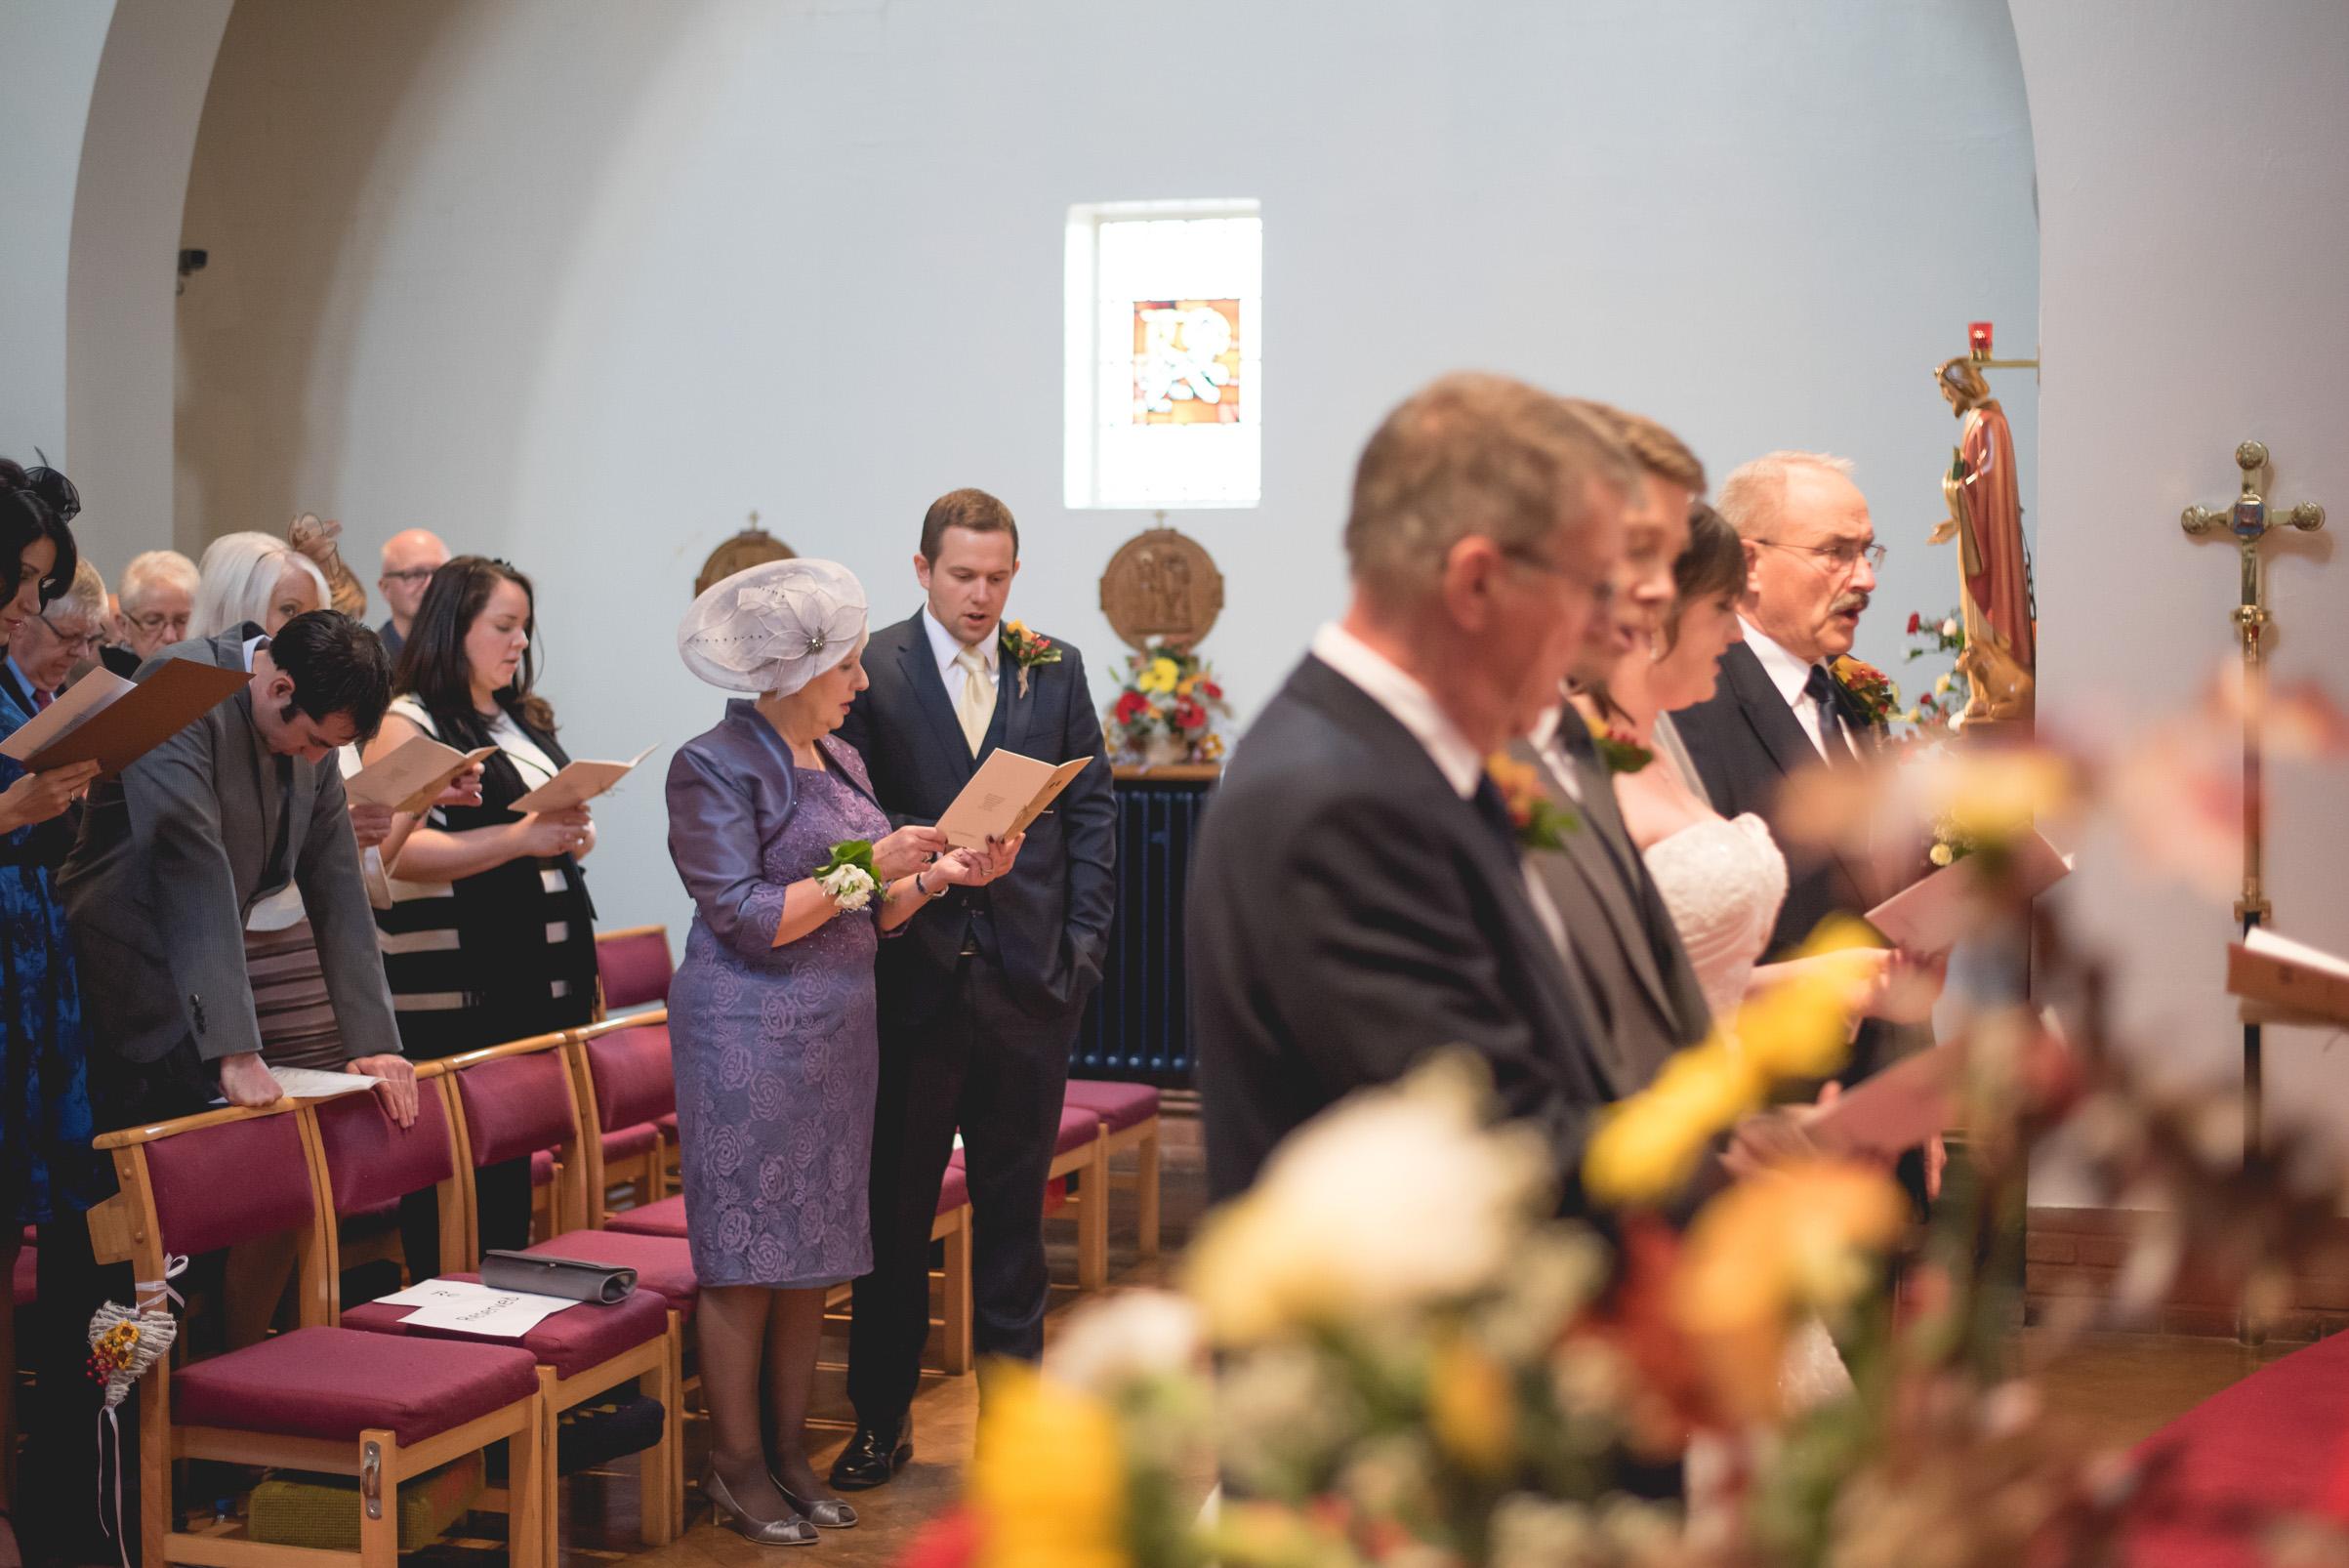 The+Fairlawns+wedding+Aldridge+StLukes+Church-82.jpg